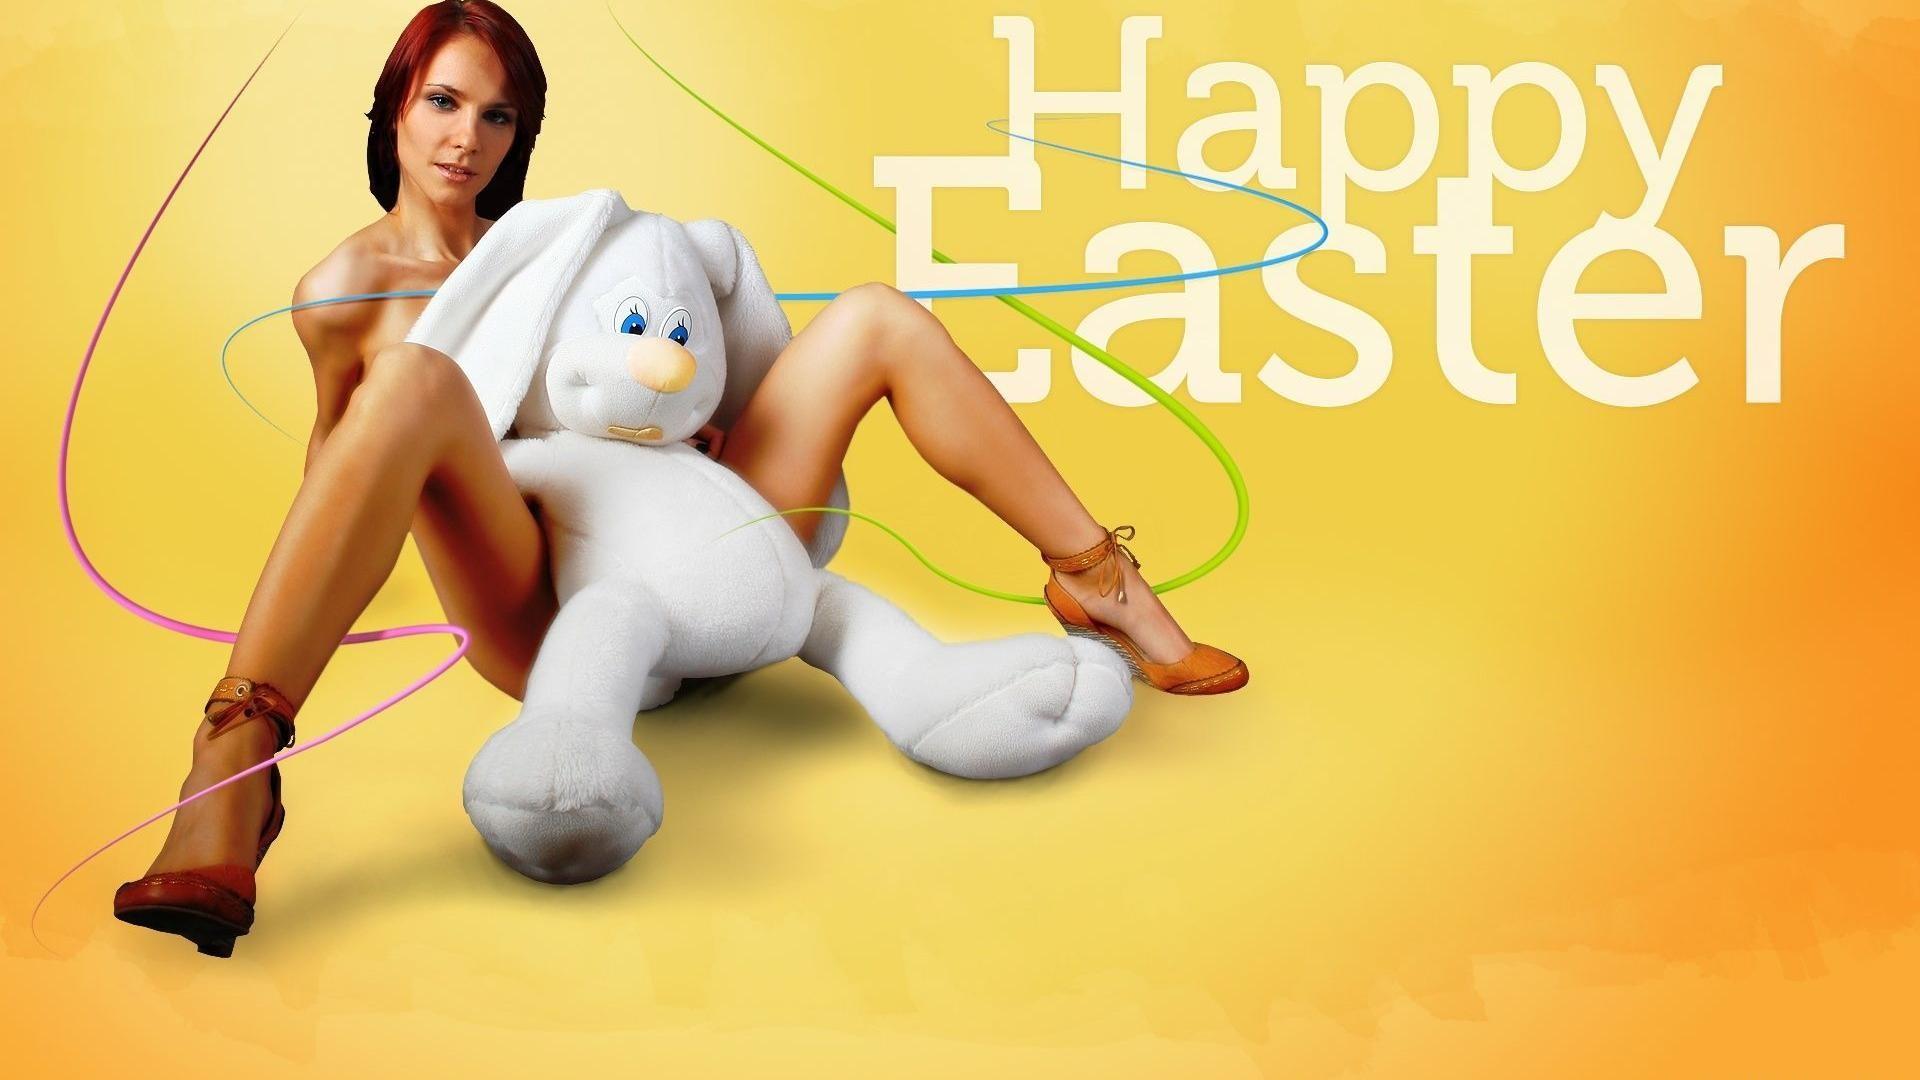 Happy Easter Bunny 2013 HD Wallpaper